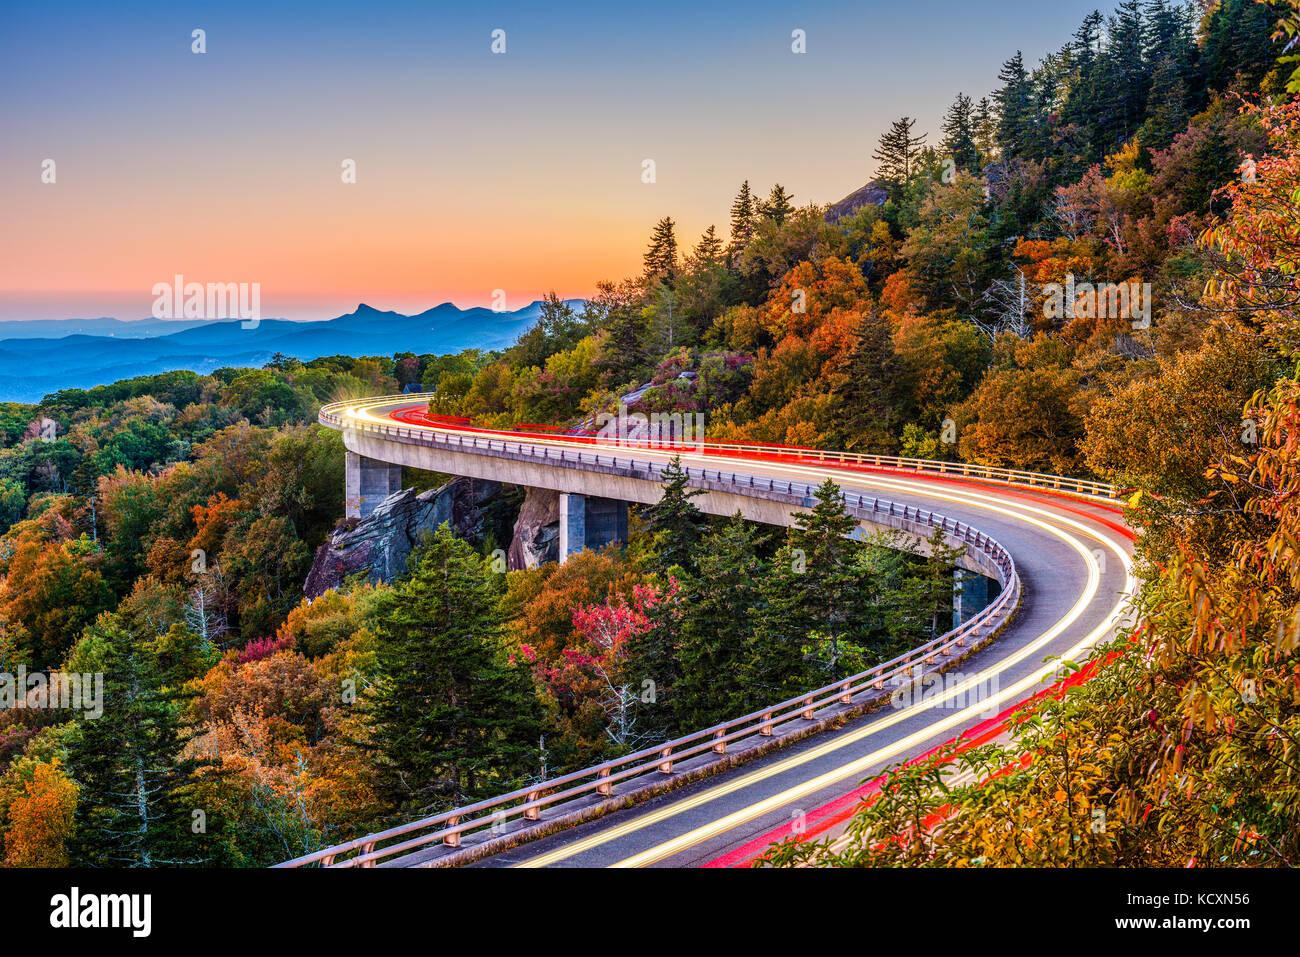 Linn Cove Viaduct, Grandfather Mountain, North Carolina, USA. - Stock Image